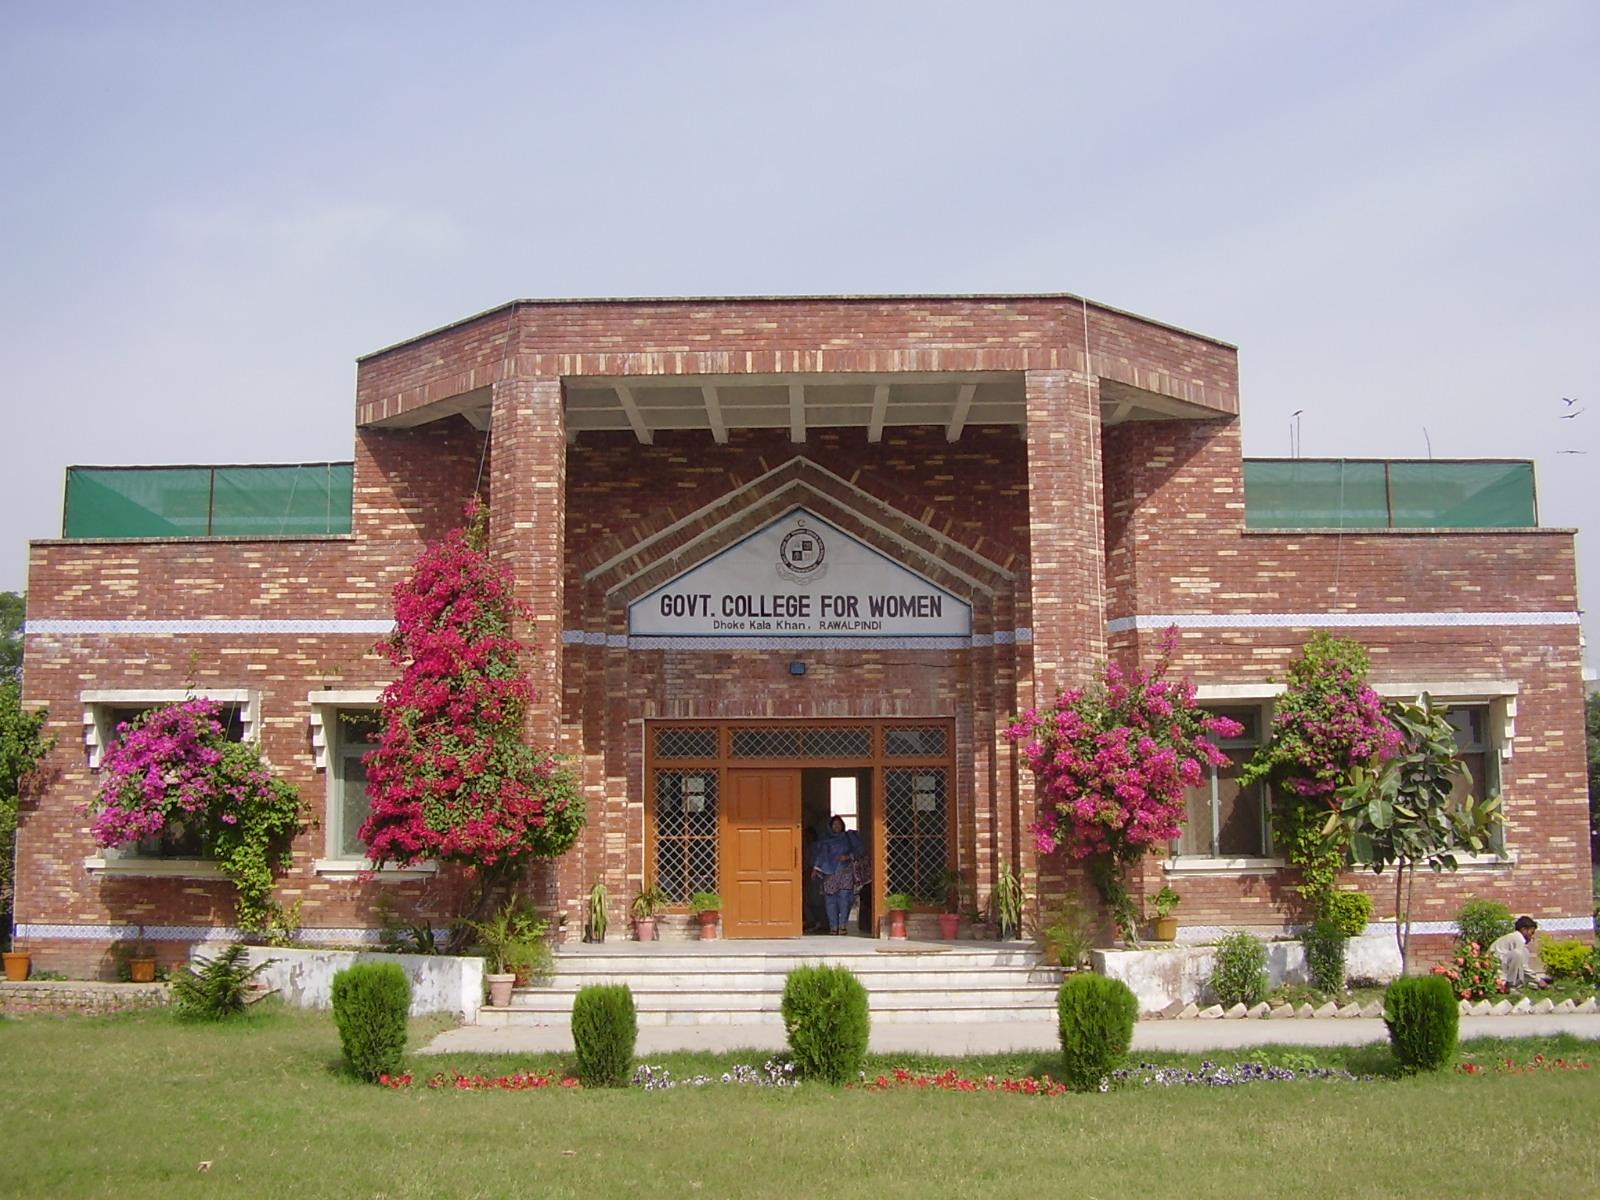 Government_college_for_Women_Dhoke_Kala_Khan.JPG (1600×1200)